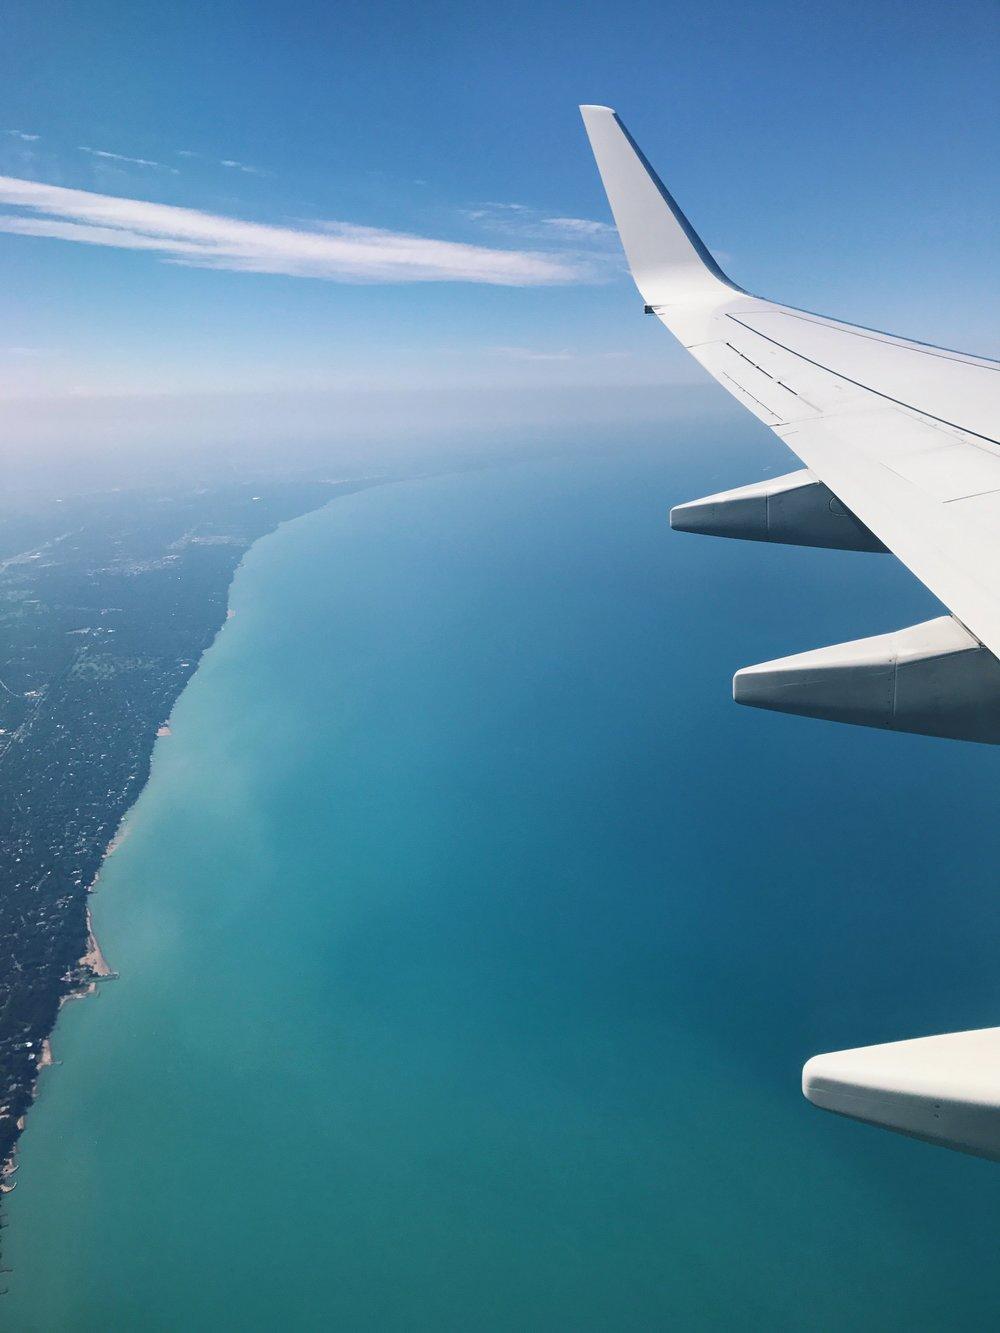 Lake Michigan looks so tropical!